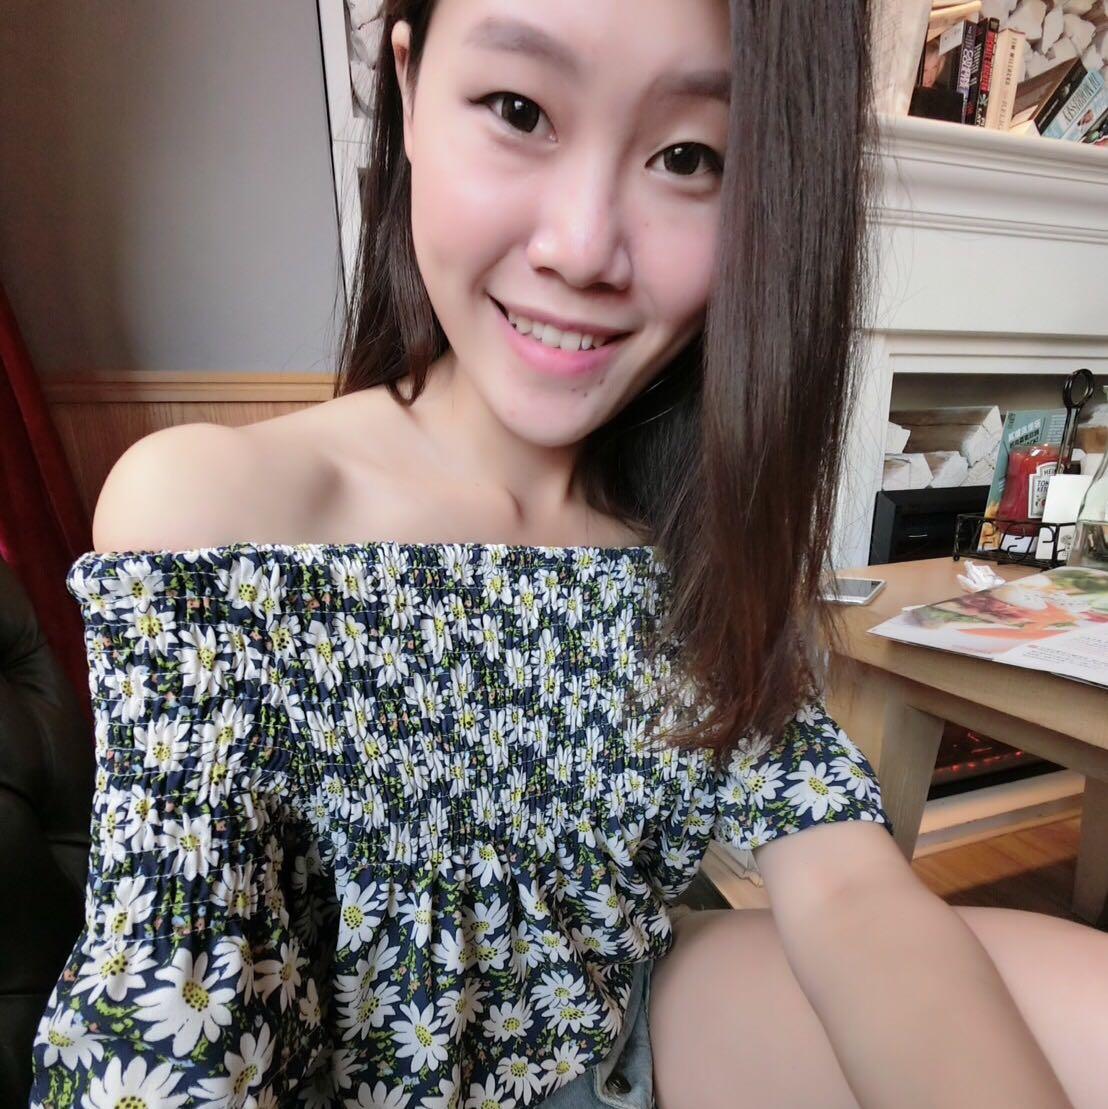 gwanhuang